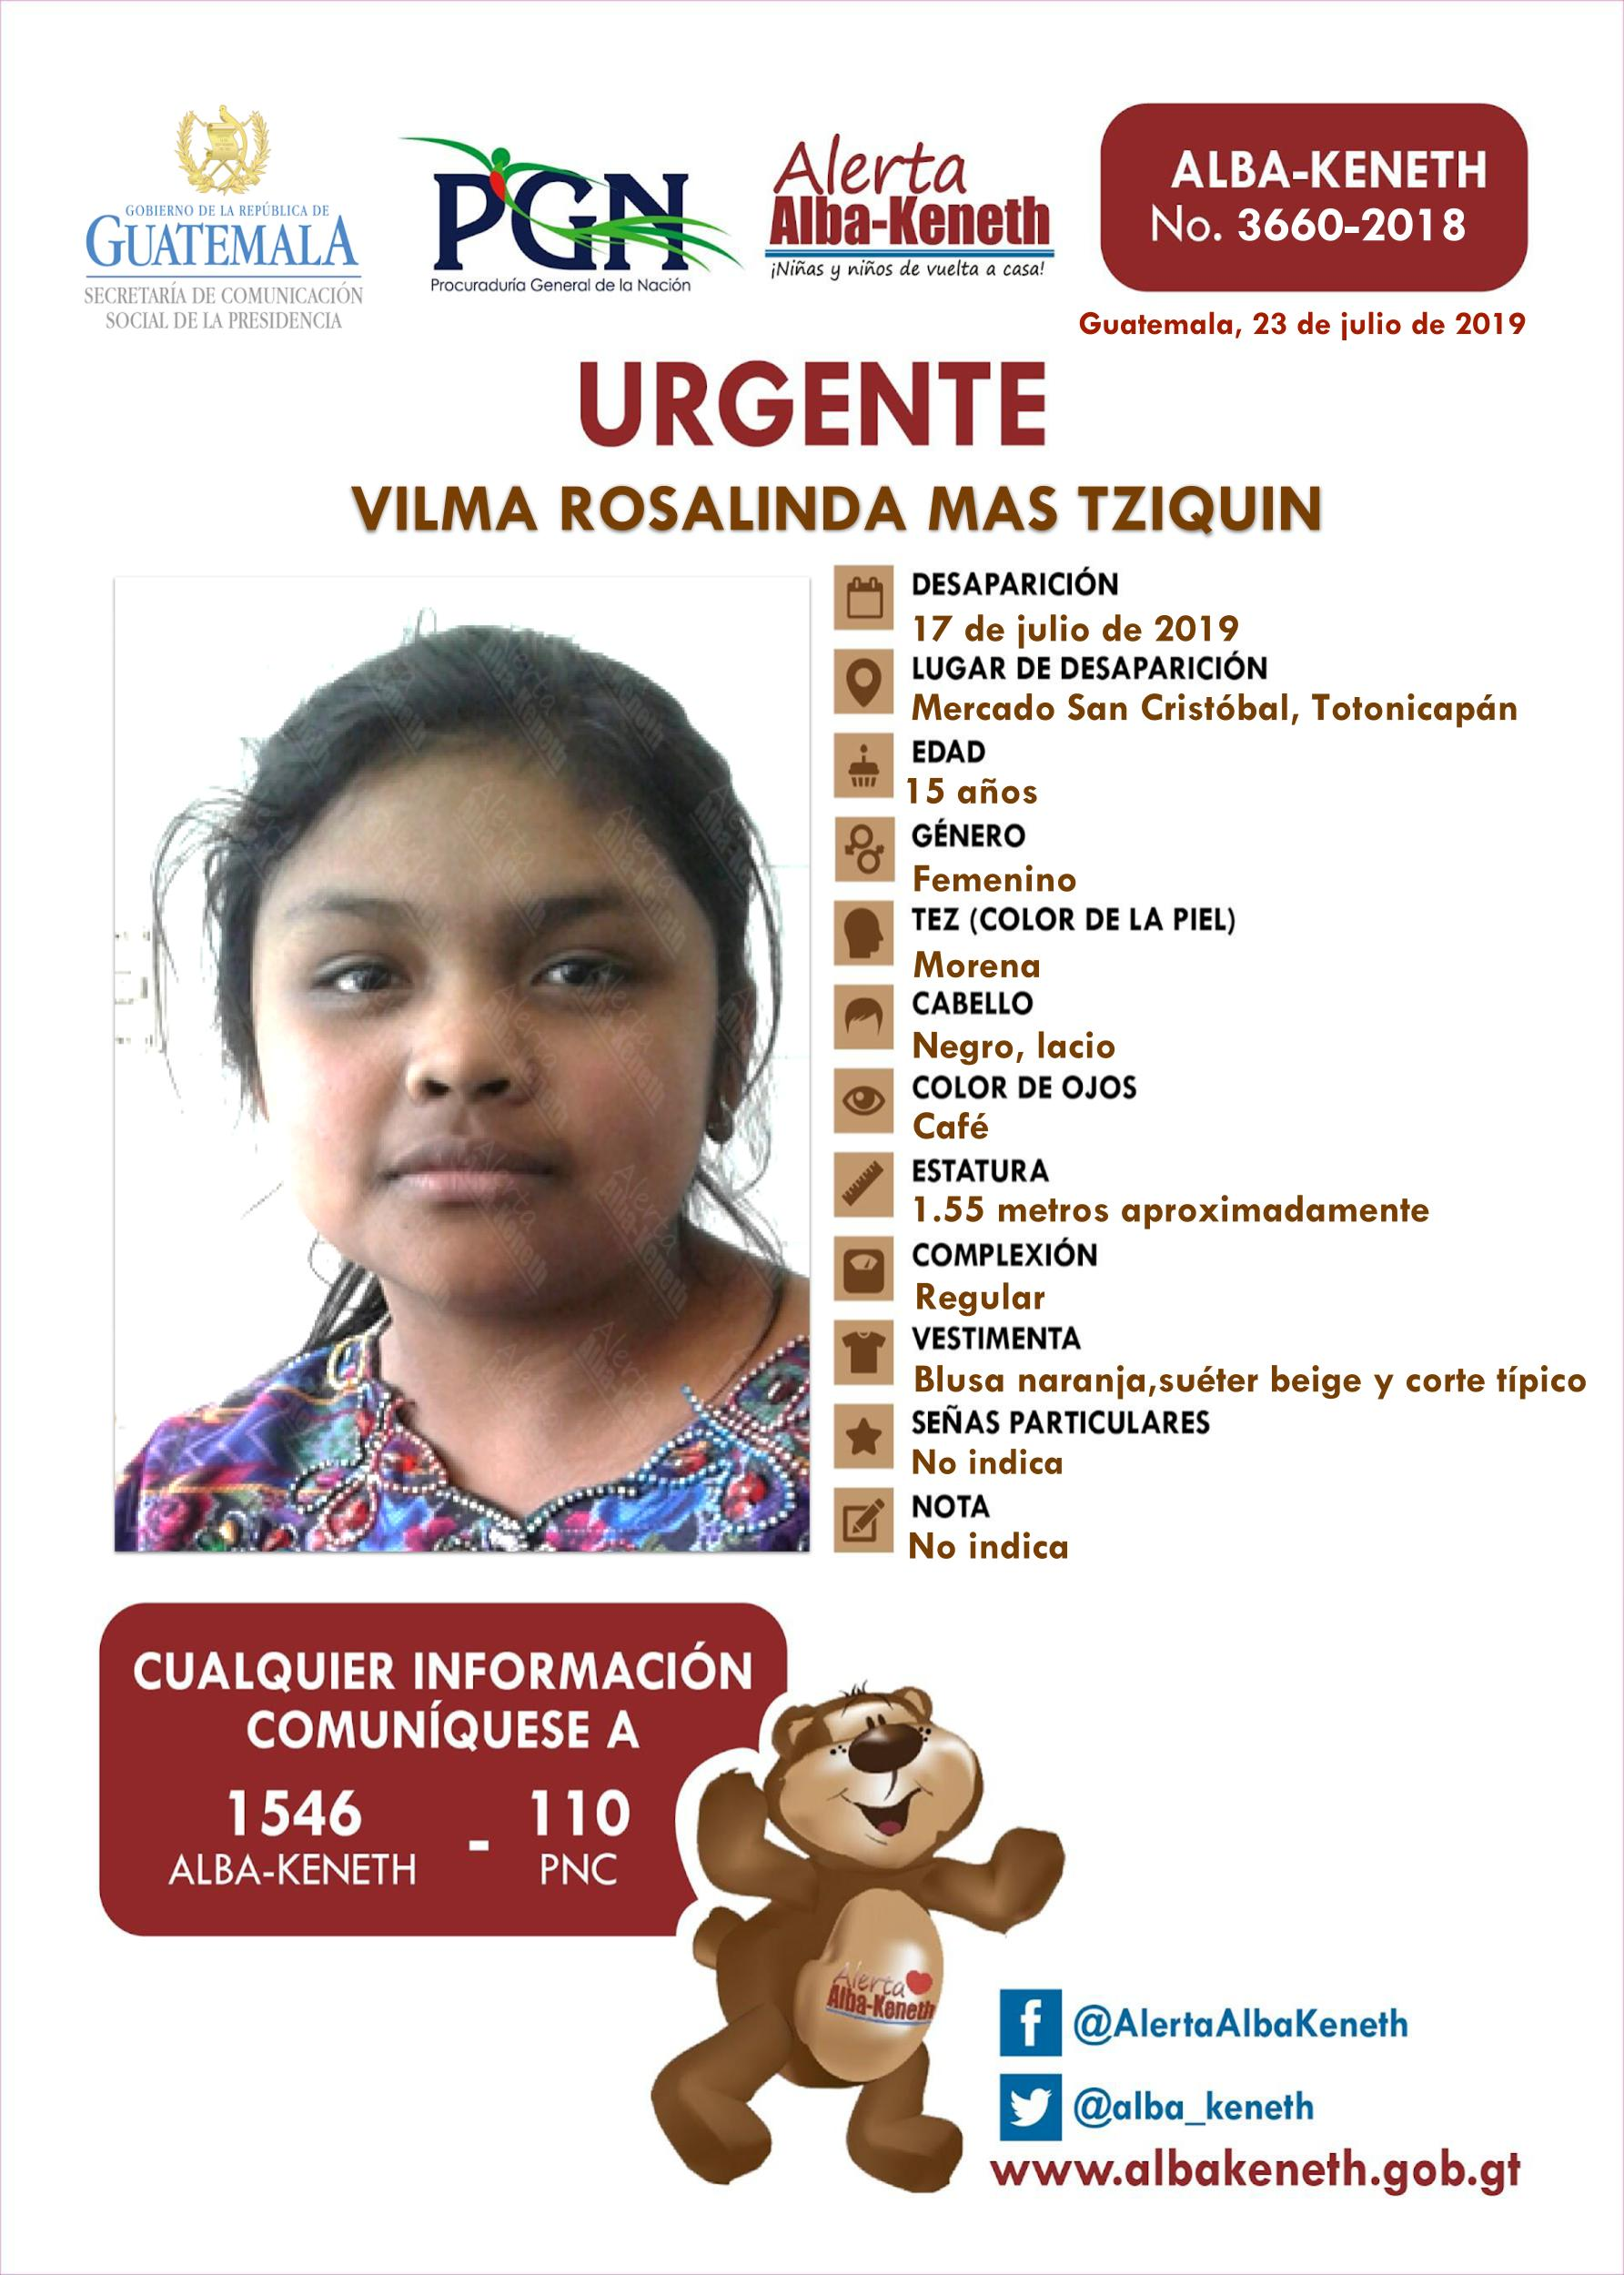 Vilma Rosalinda Mas Tziquin